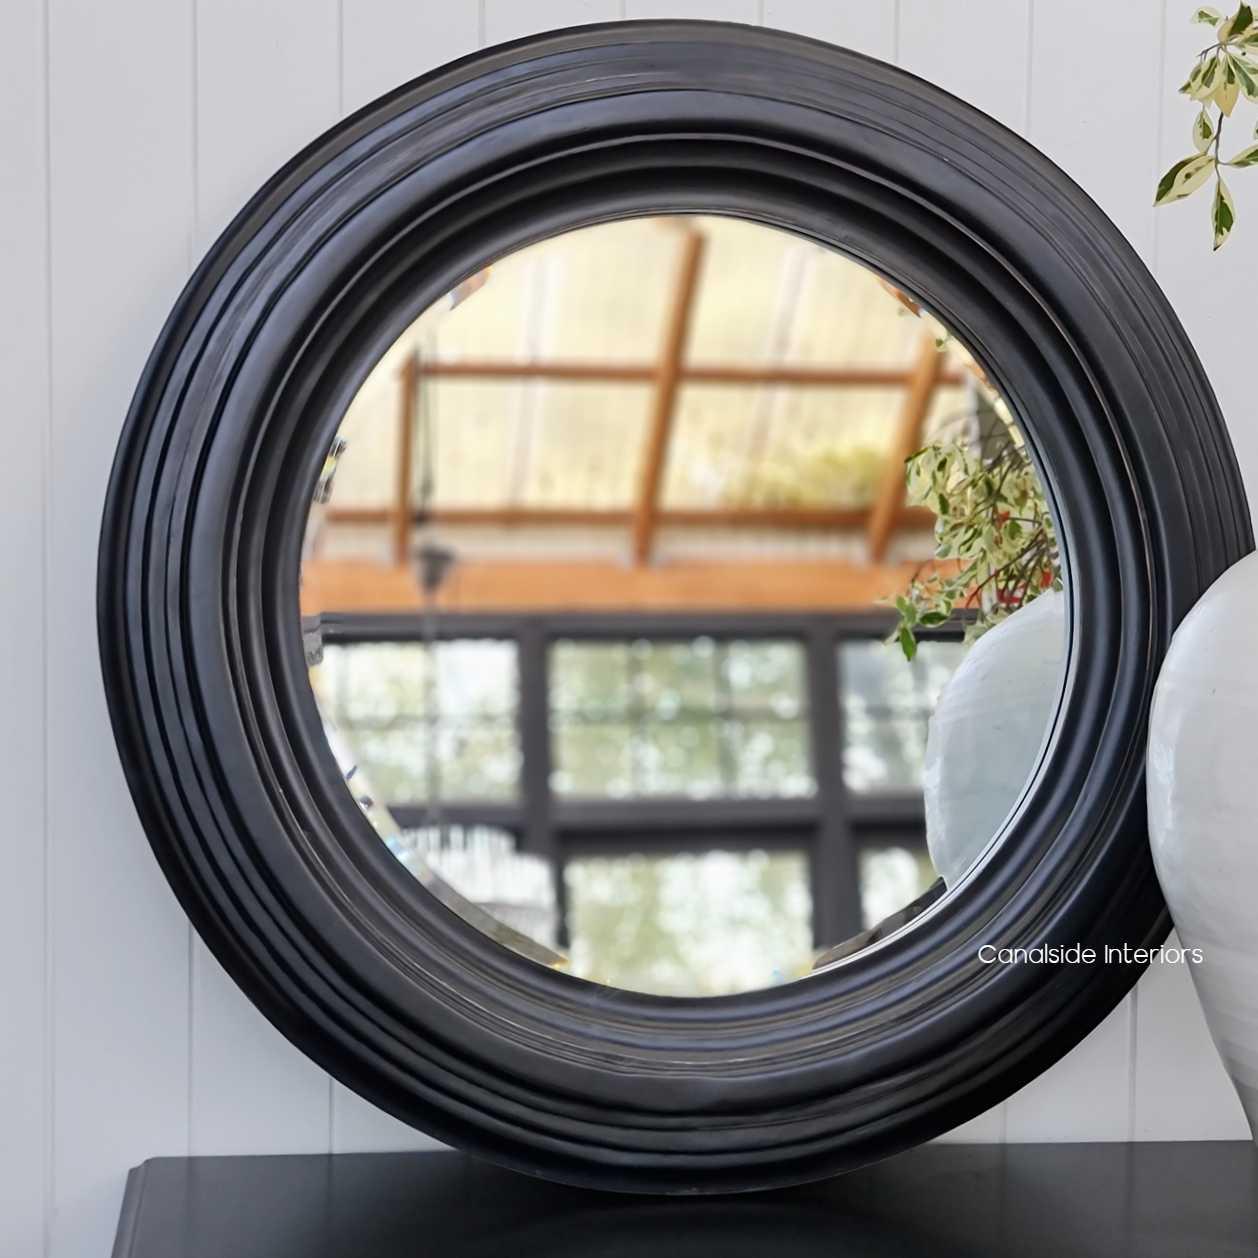 Aspen Mirror  HAMPTONS Style, PLANTATION Style, MIRRORS, PLANTATION STYLE